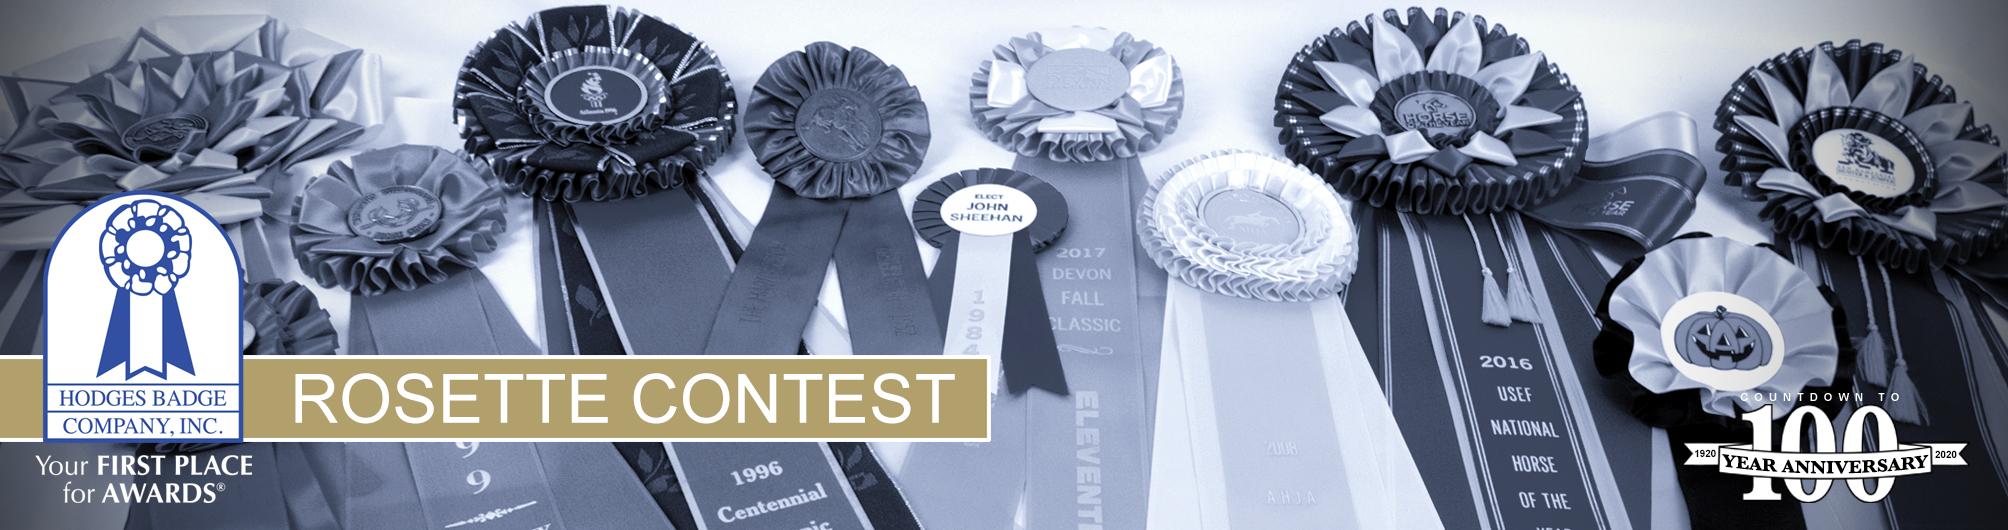 Rosette Contest Form